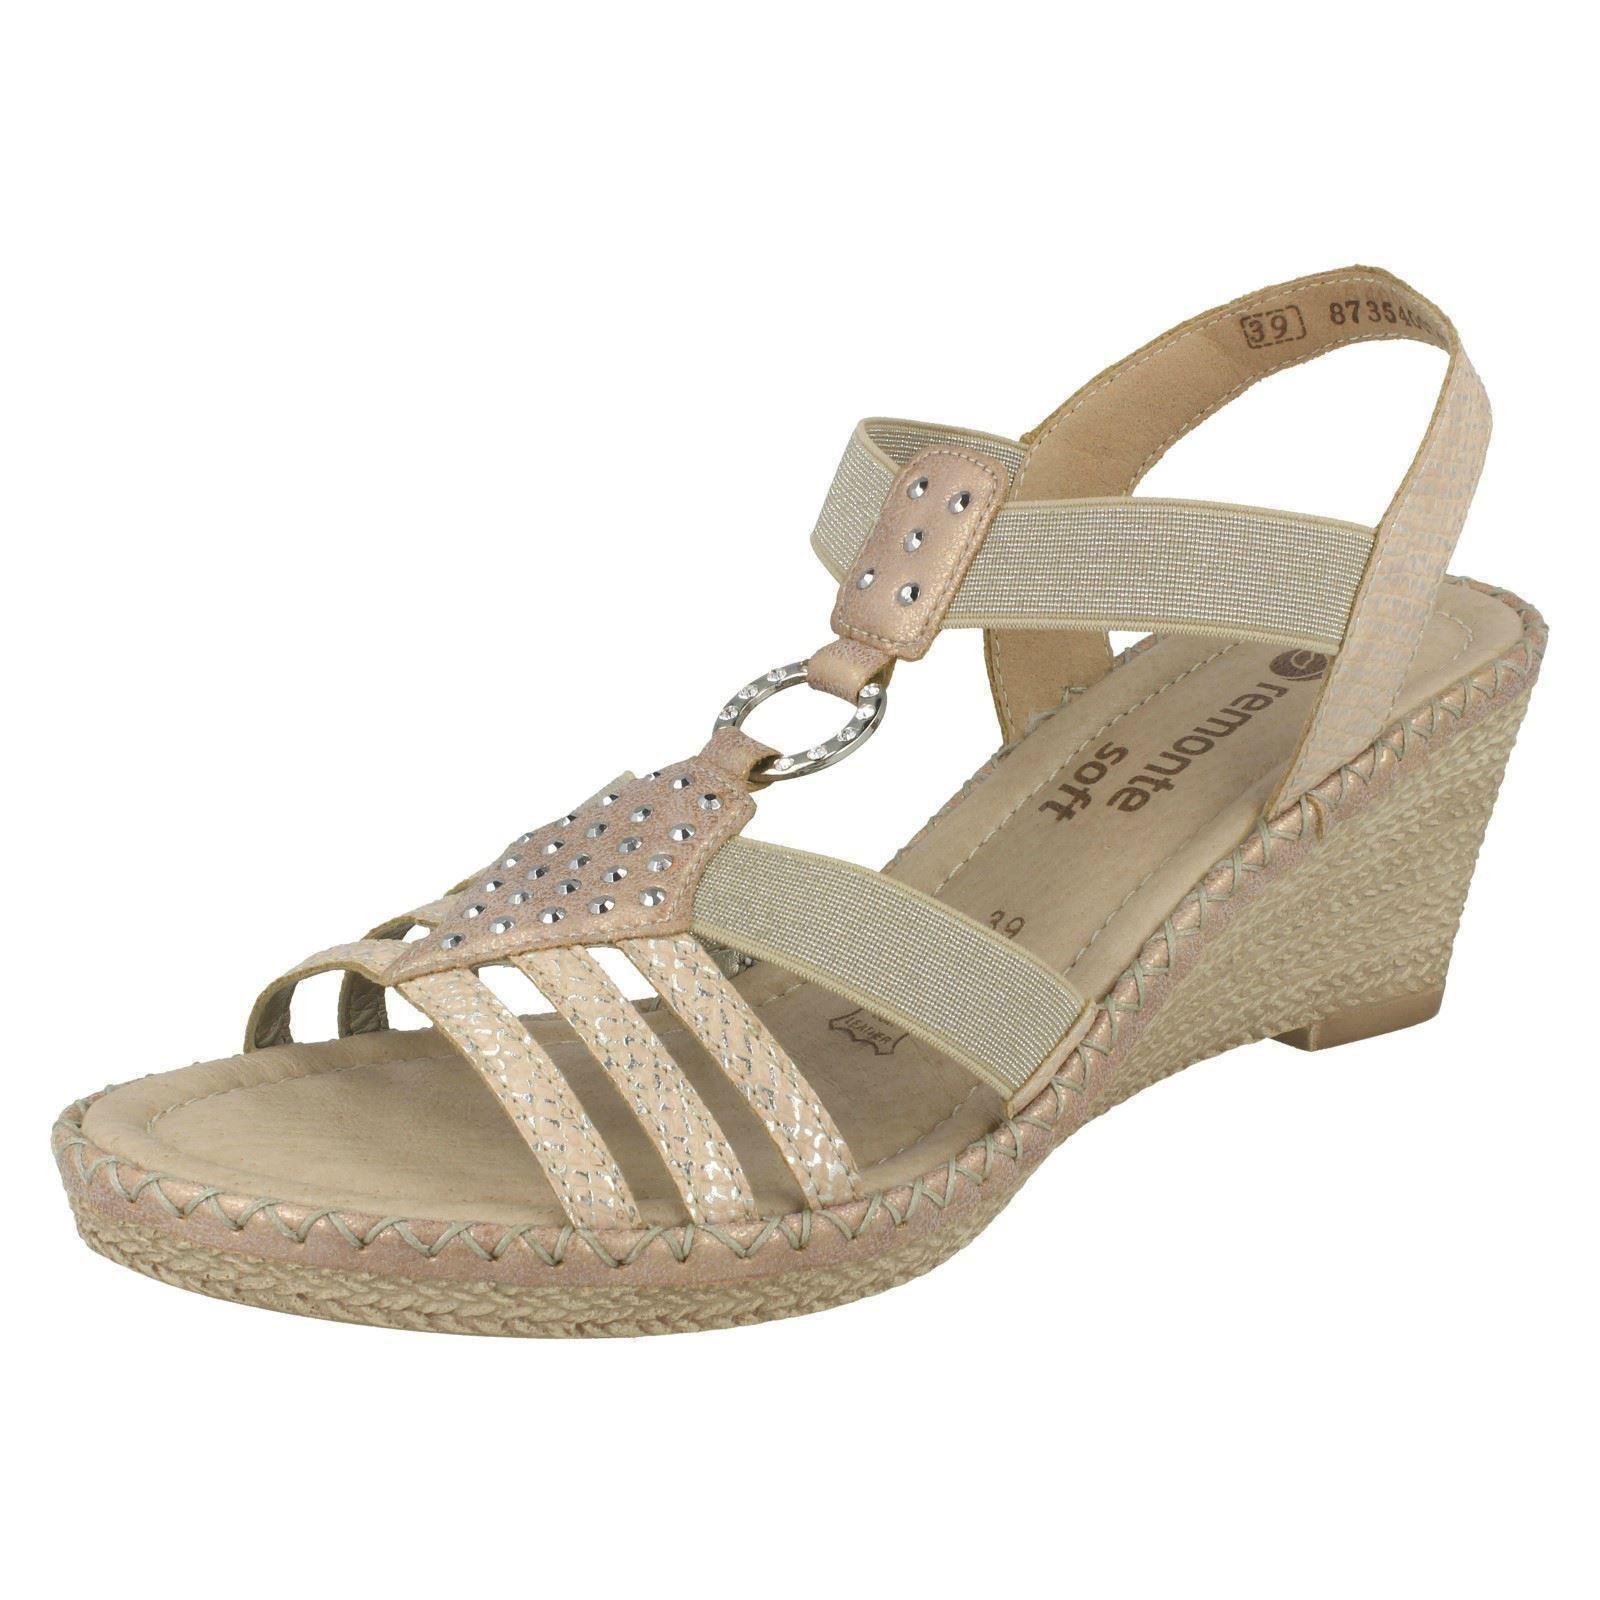 79d1e6c8226e Remonte Slip on Elasticated Wedge Heel Summer Sandals D6768-31 ...